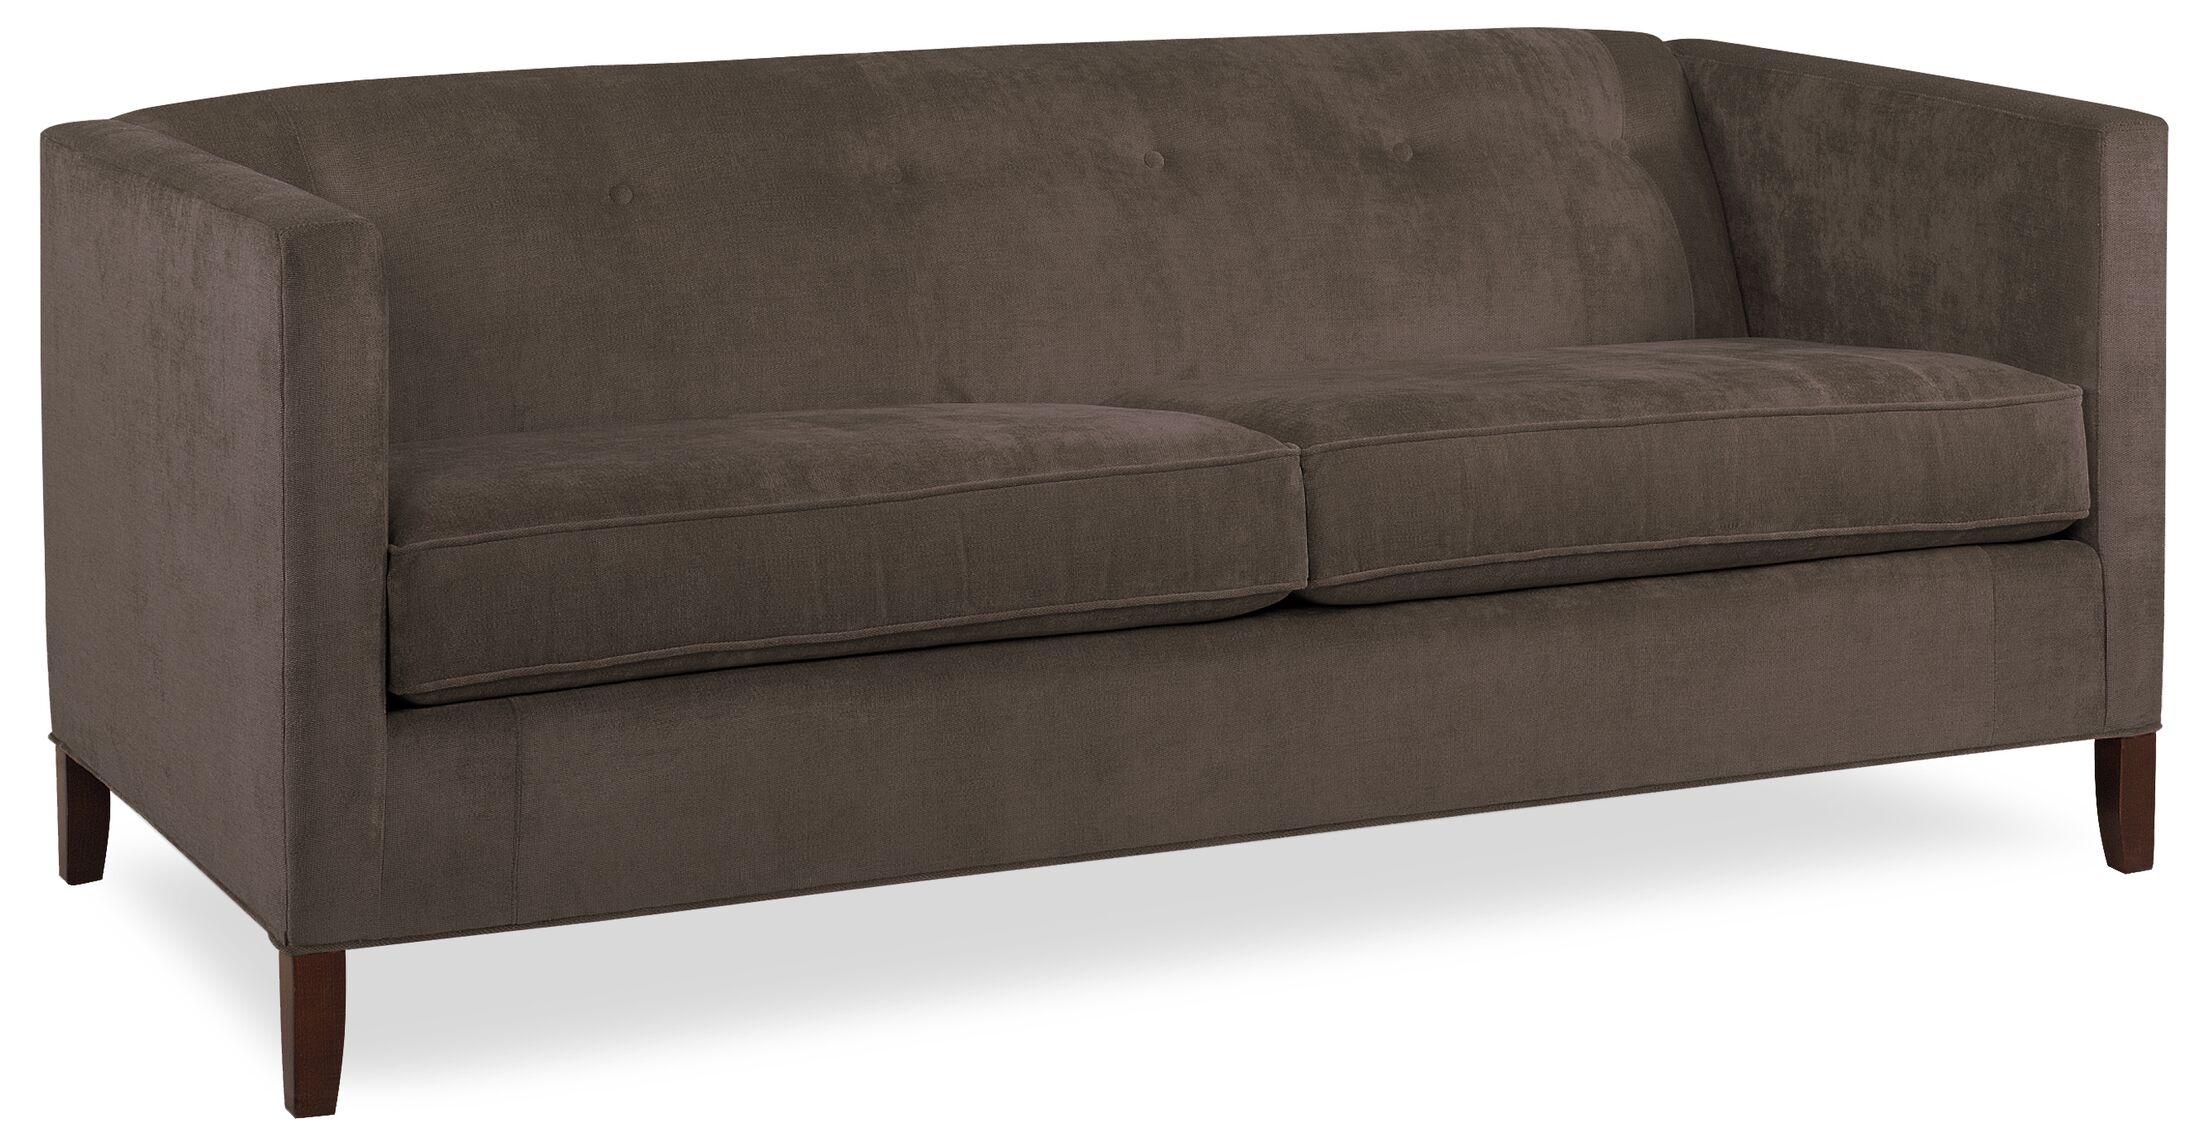 City Spaces Park Avenue Sofa Upholstery: Truffle